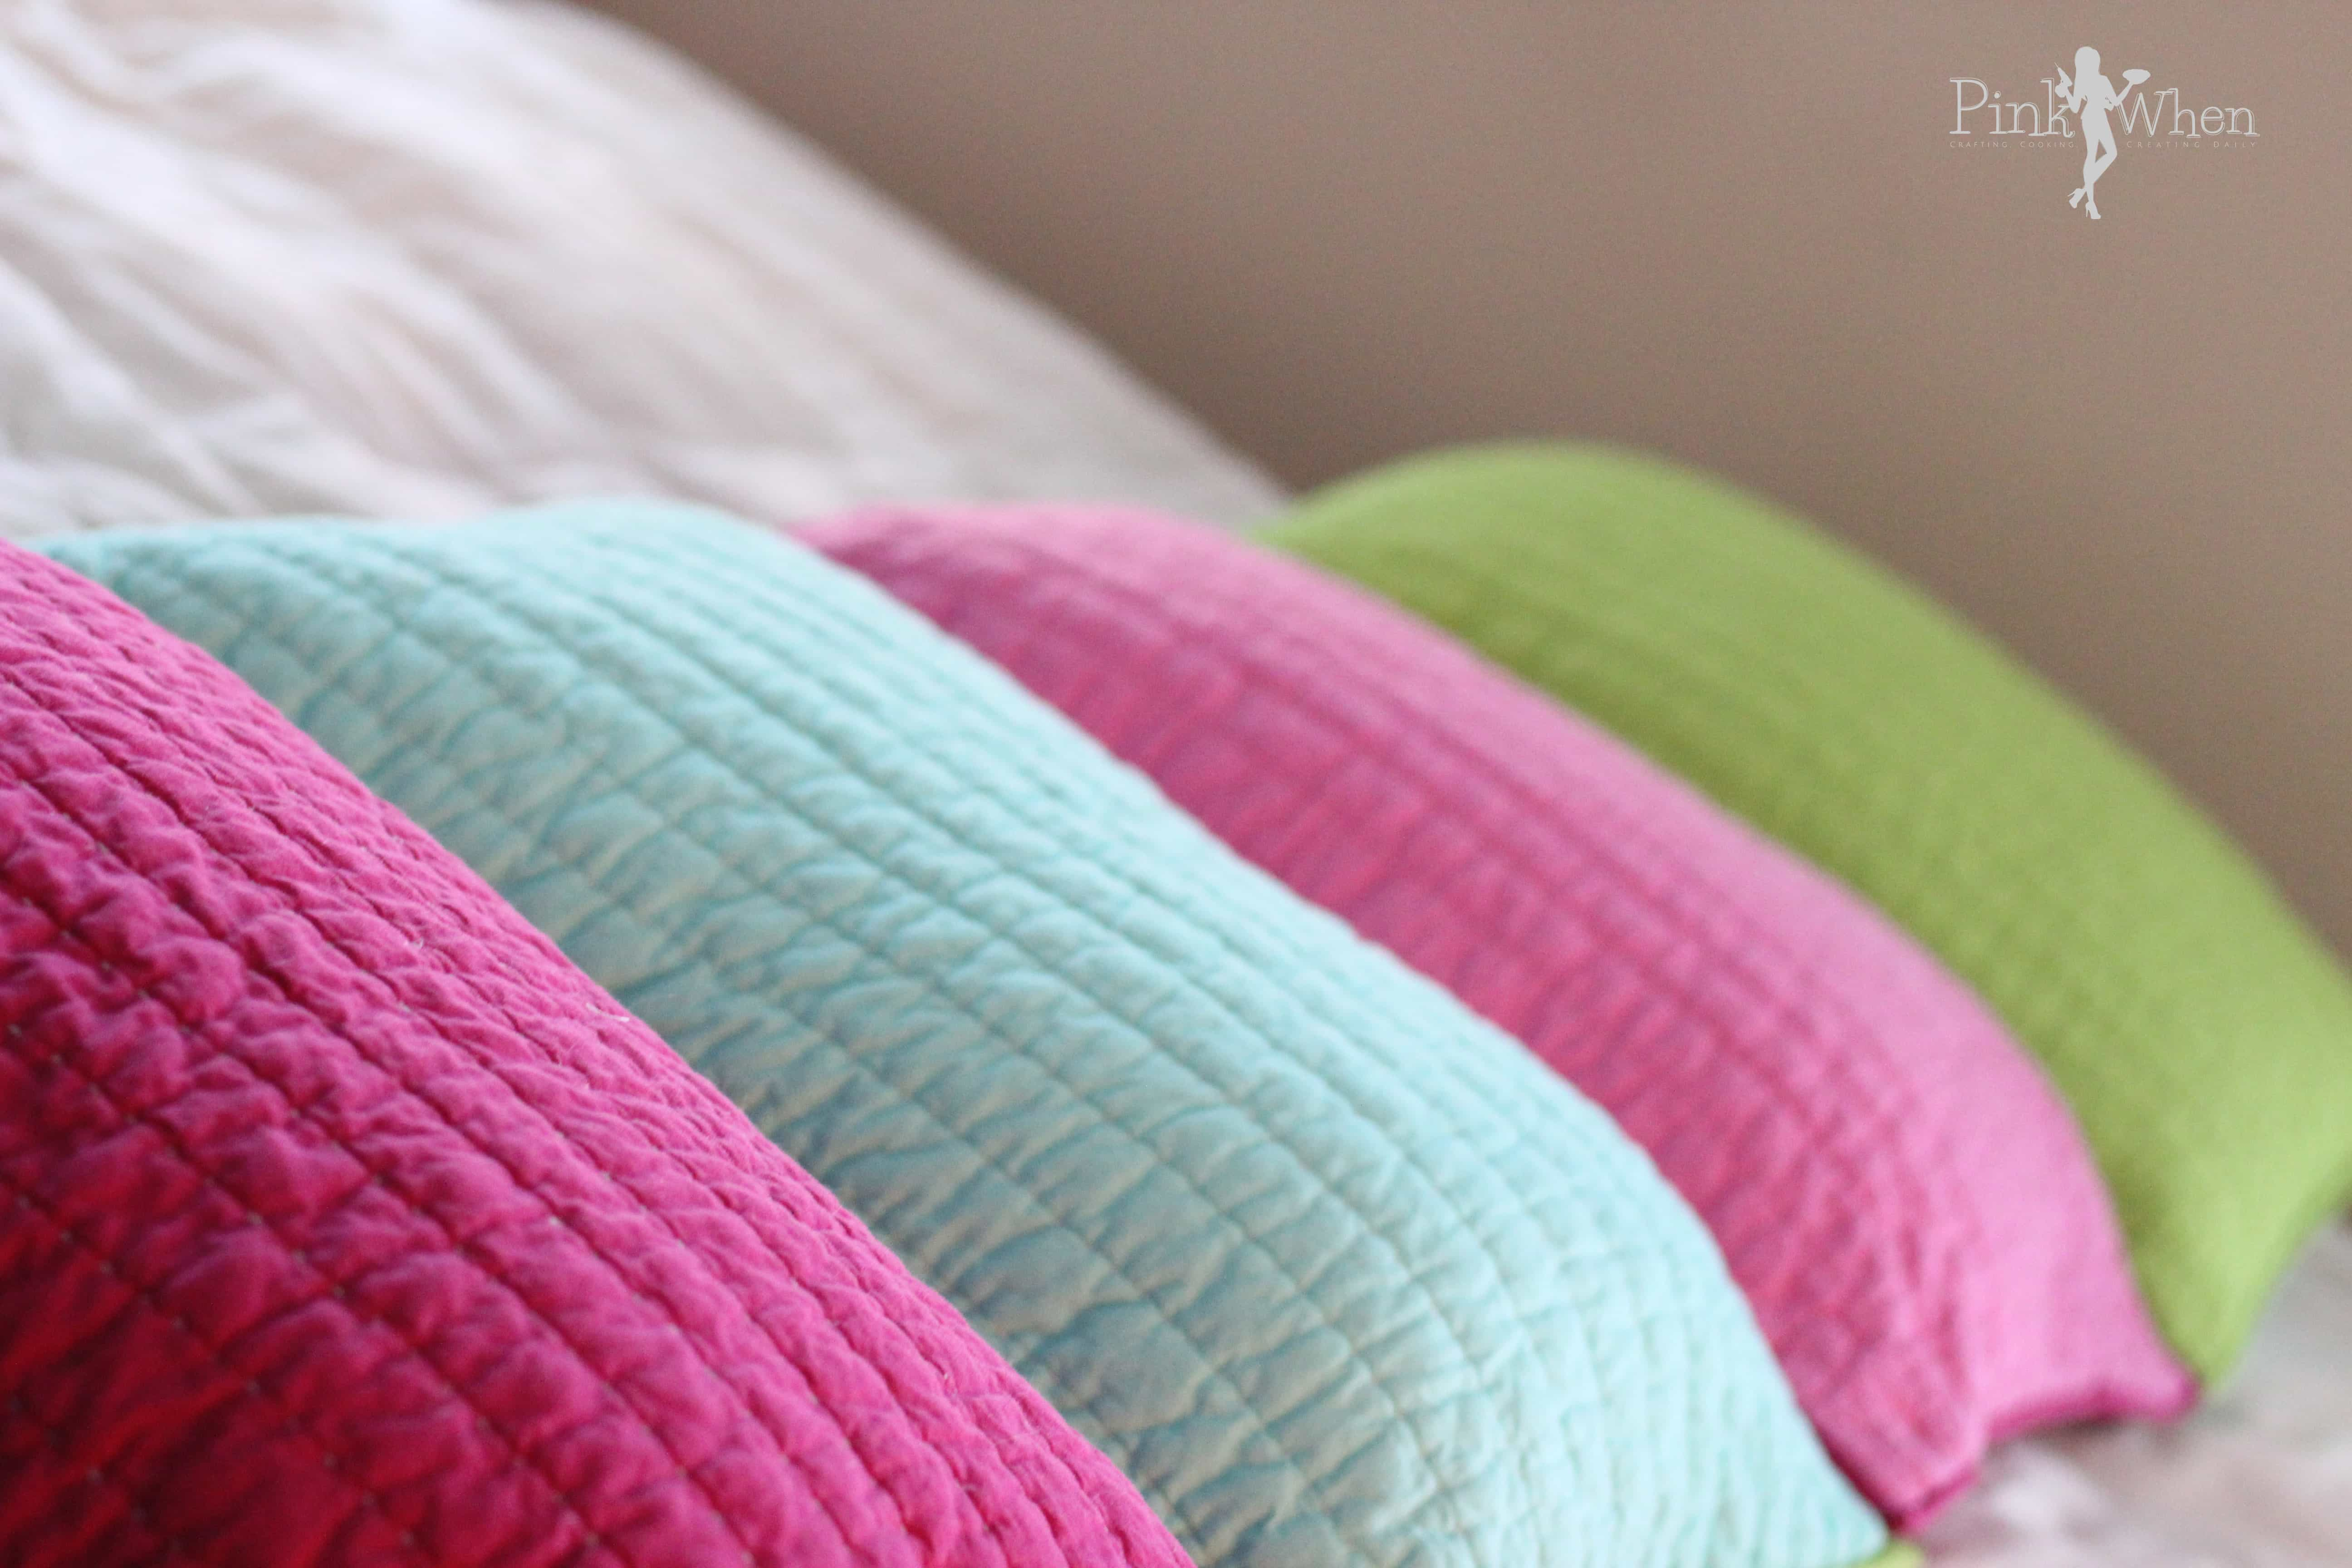 DIY Pillow Bed Tutorial PinkWhen